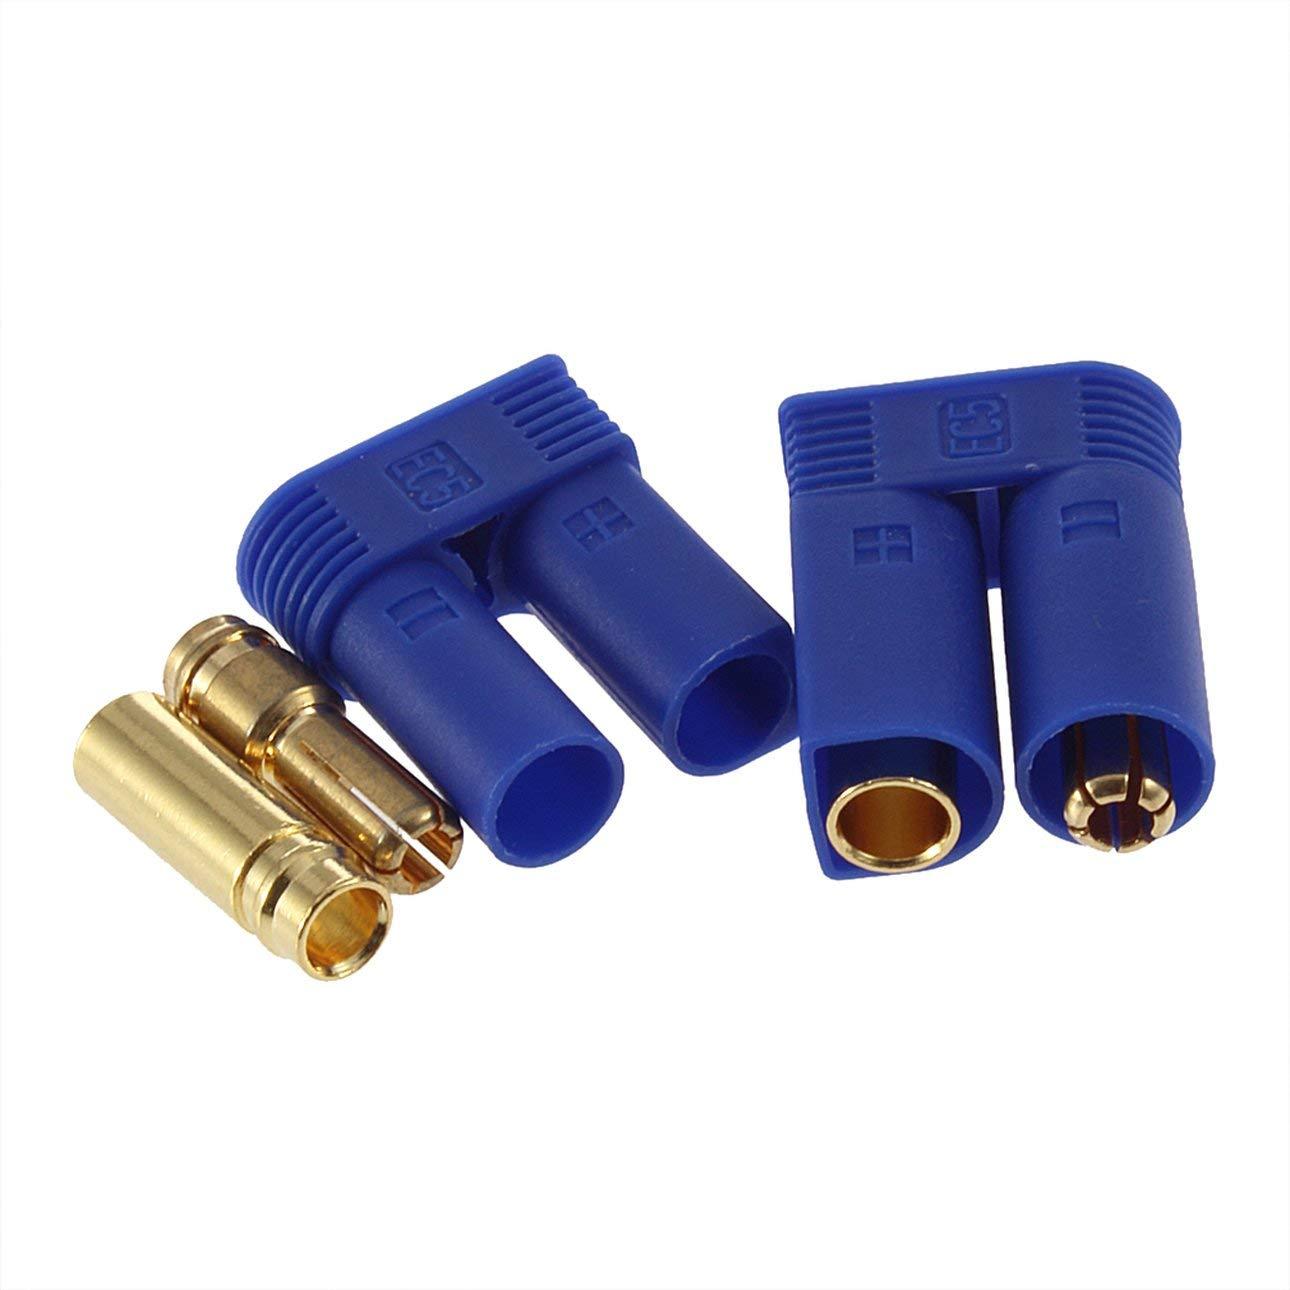 Liobaba 1 Pair EC5 Bullet Connectors Plugs Adapters Male/Female Losi Style 5mm